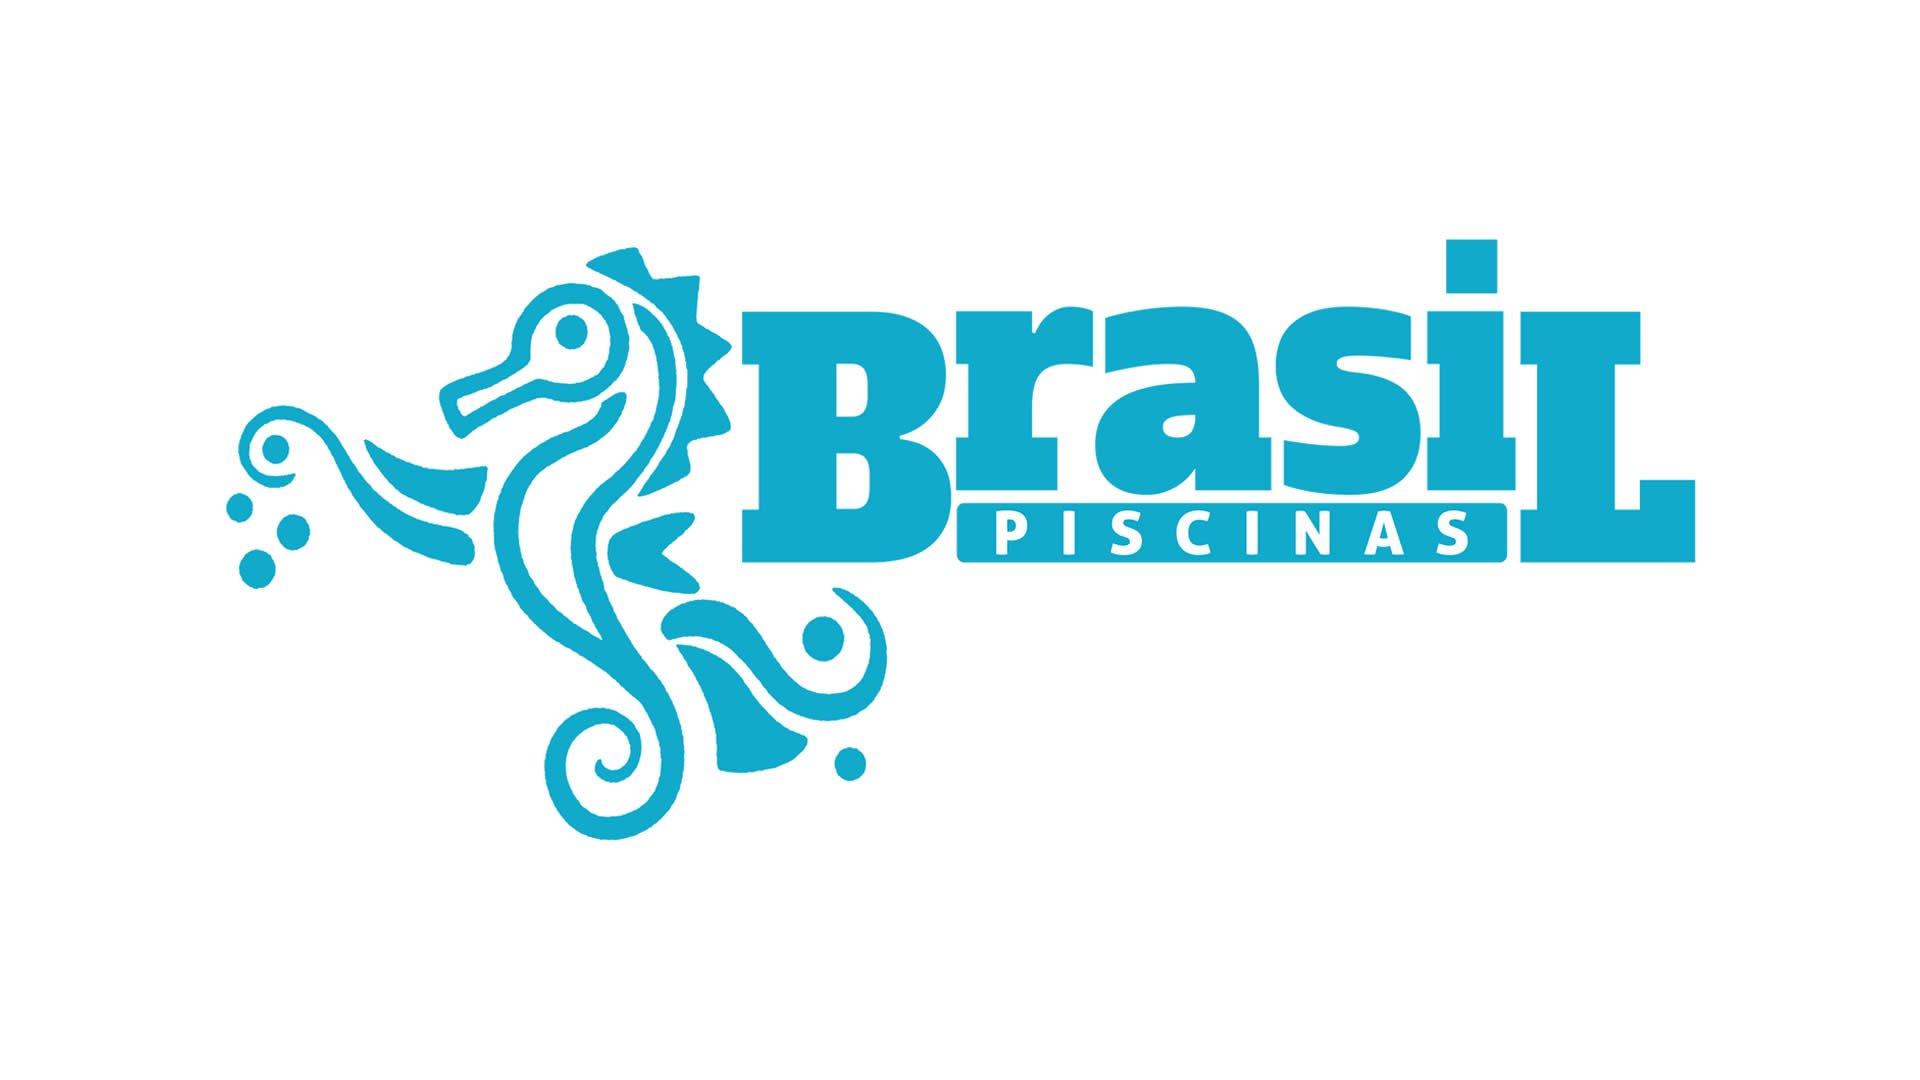 Brasil Piscinas